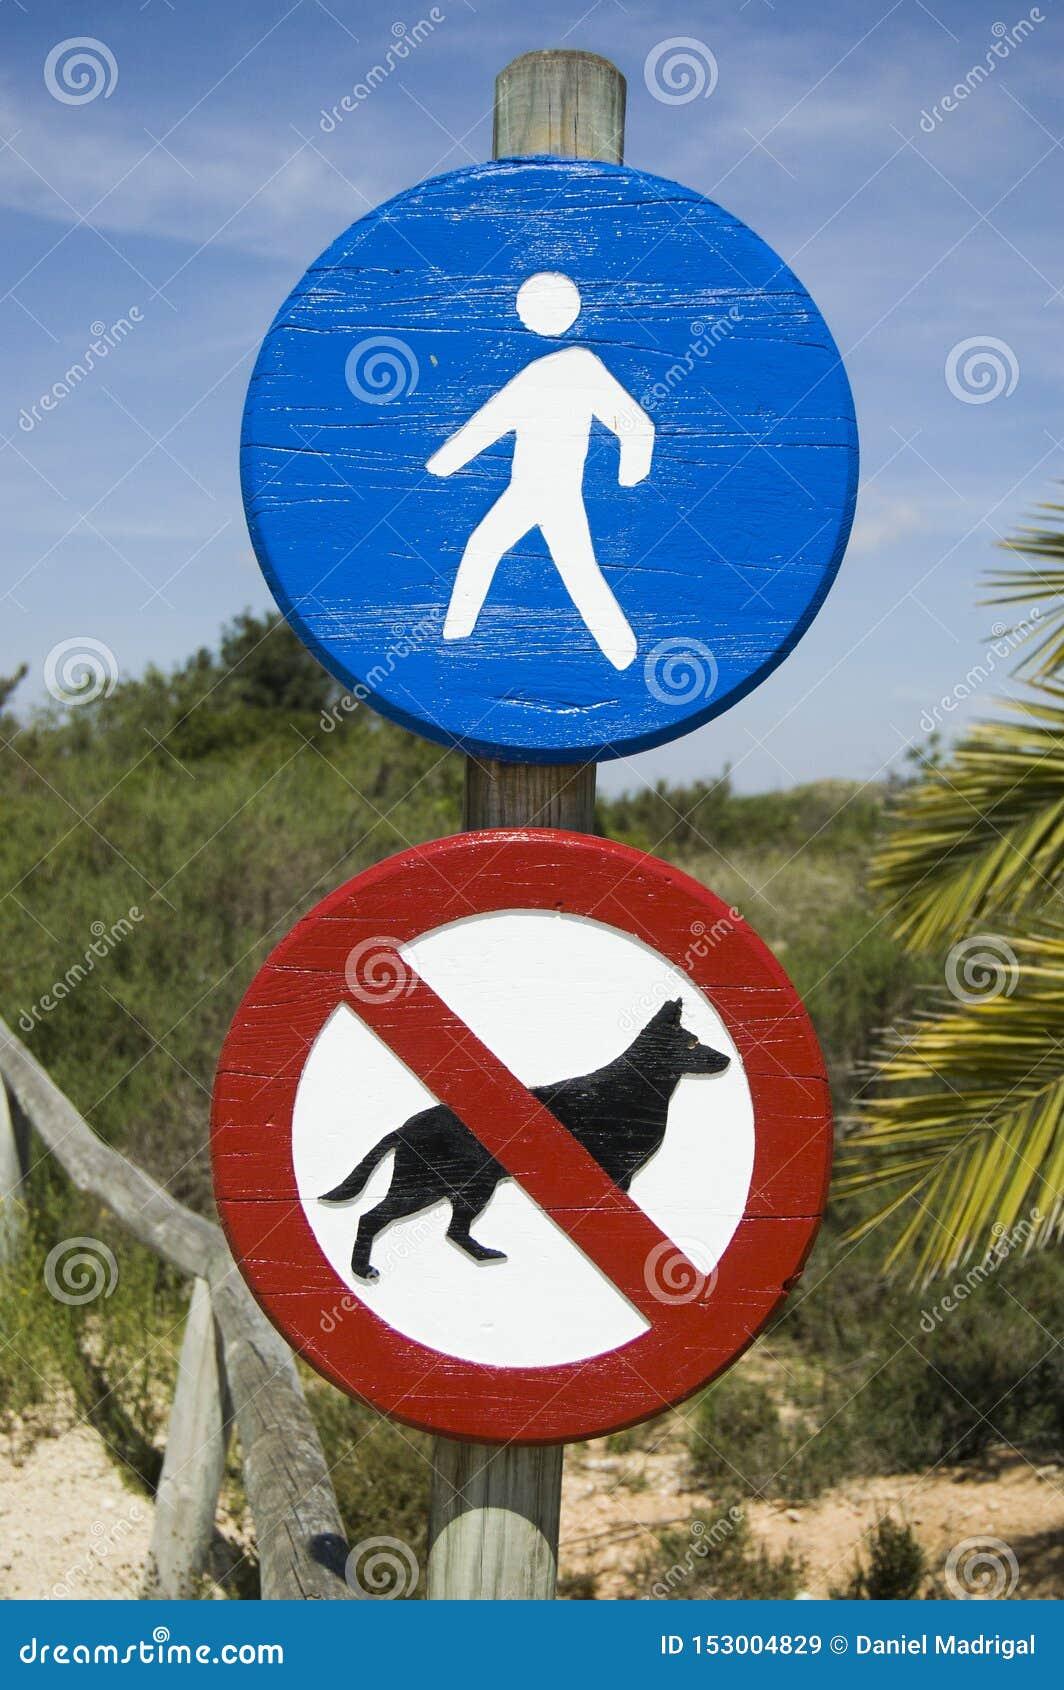 Acesso do sinal ao pedestre e aos cães proibidos